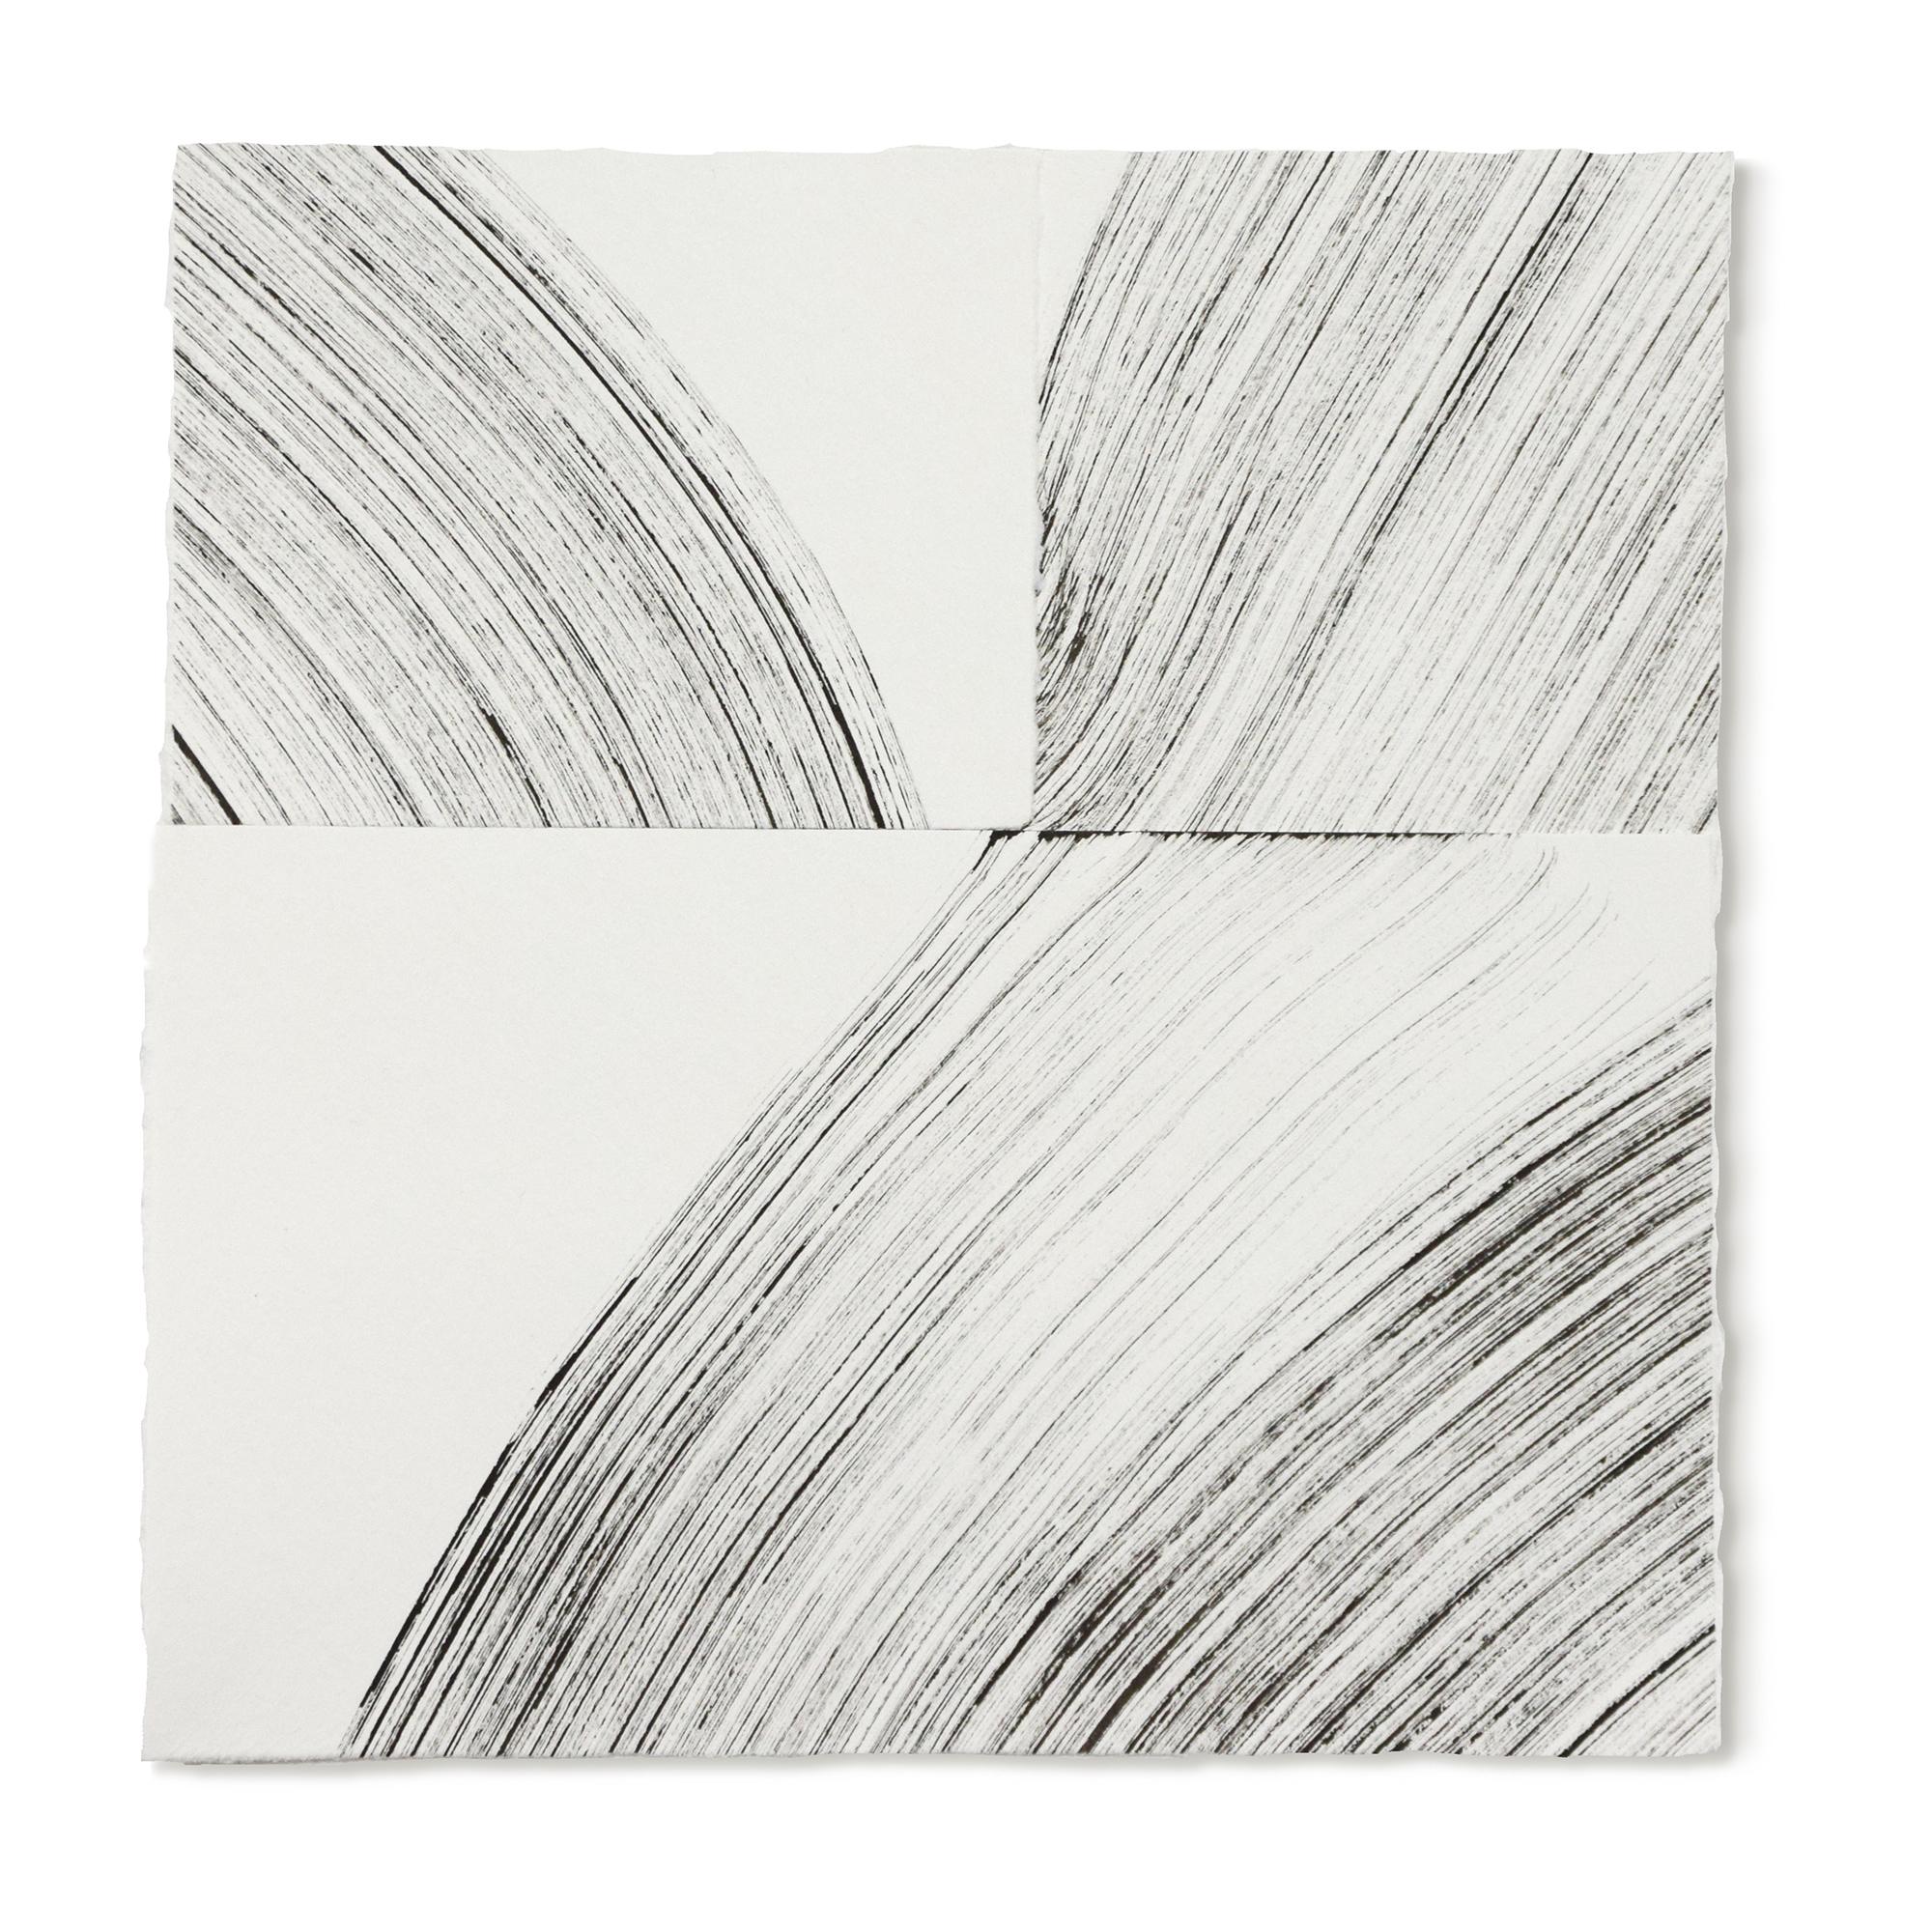 Tie No. 3: Together/Across